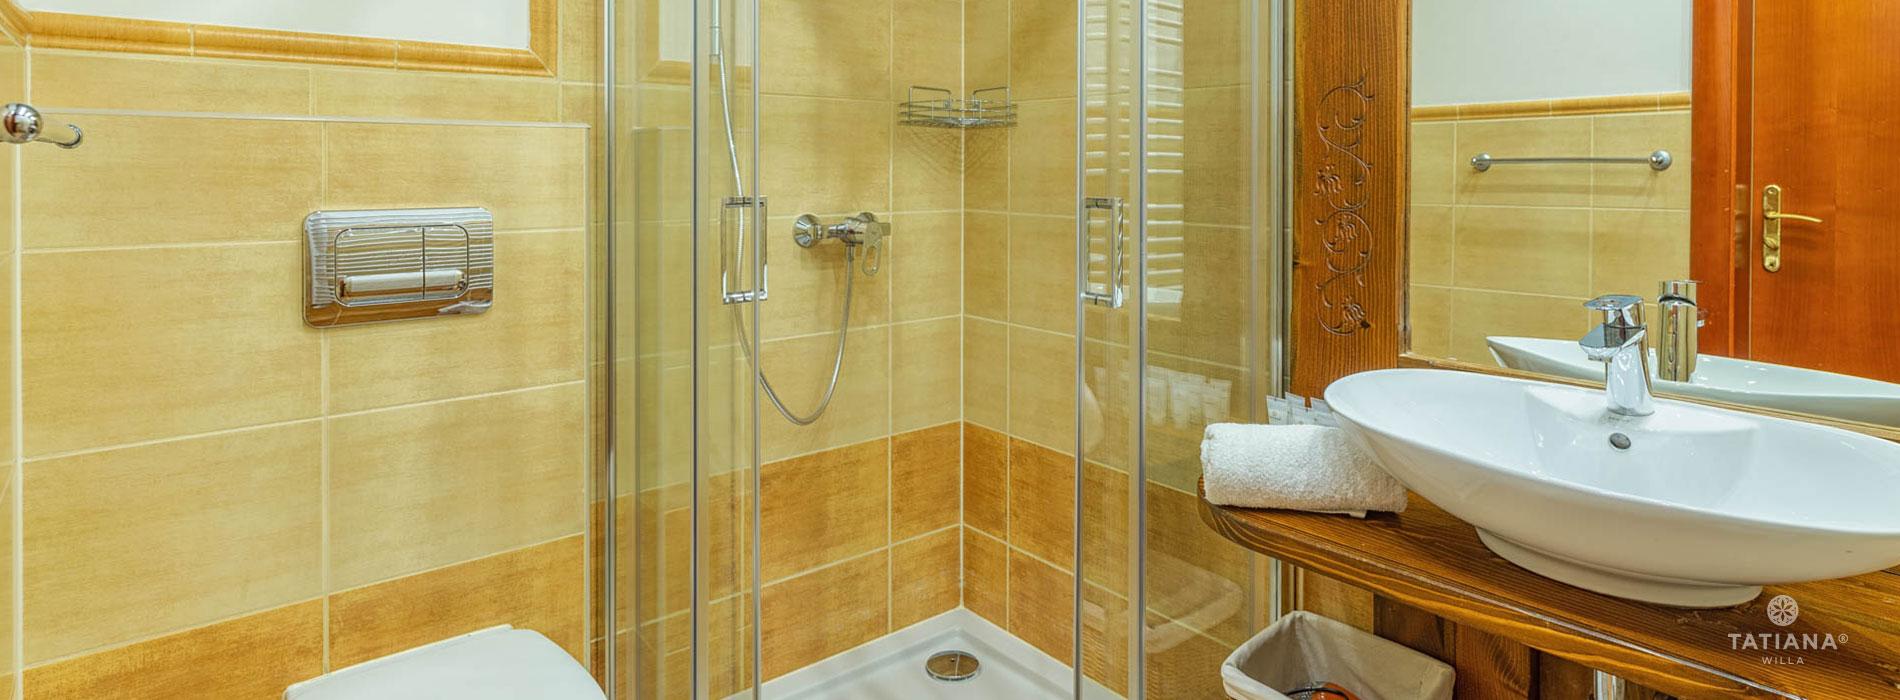 Apartament Premium 5 - łazienka